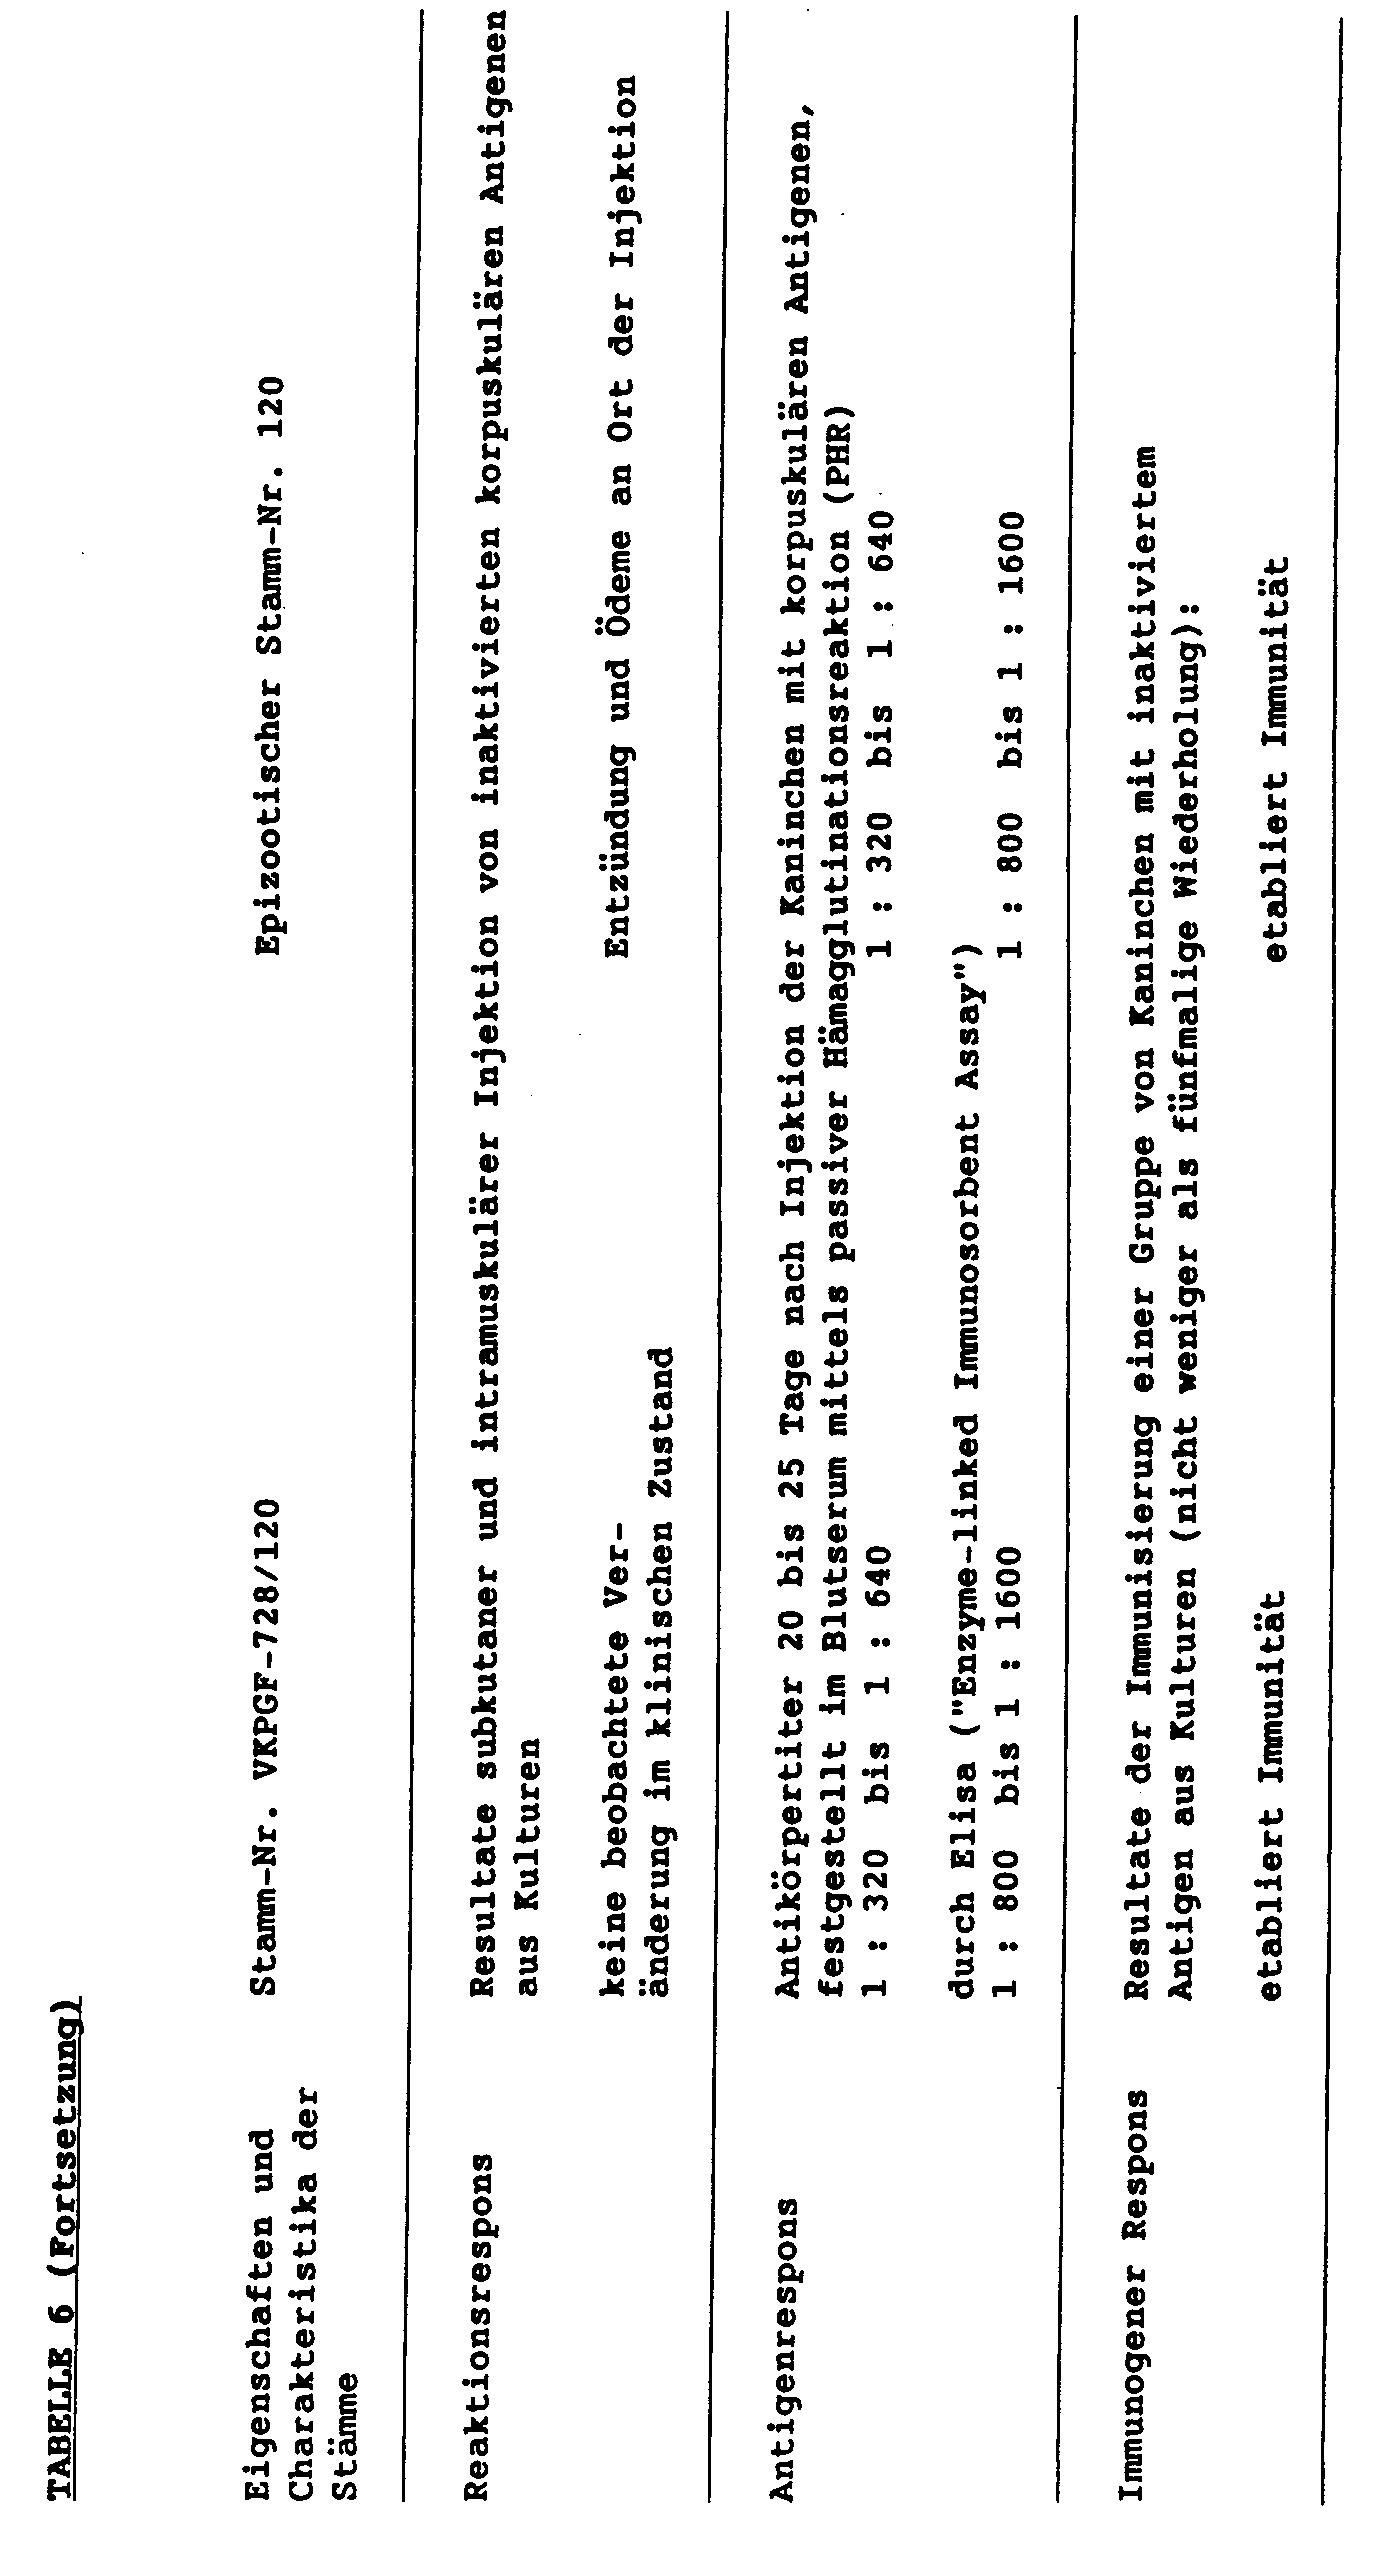 Ep0564620b1 Dermatomykose Vakzine Google Patents